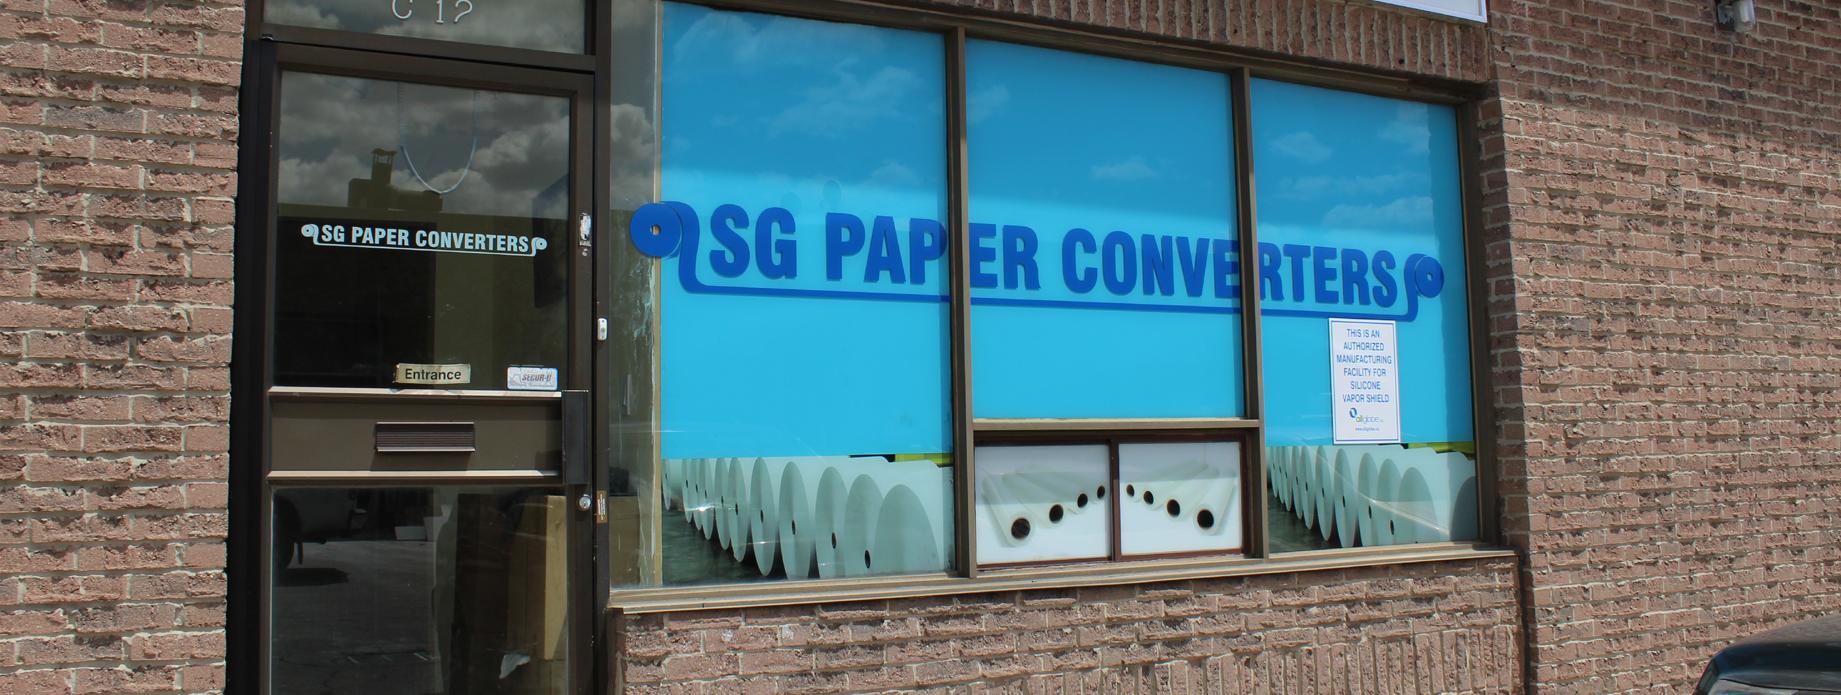 Sg Paper Converters Newsprint Paper Doctors Examination